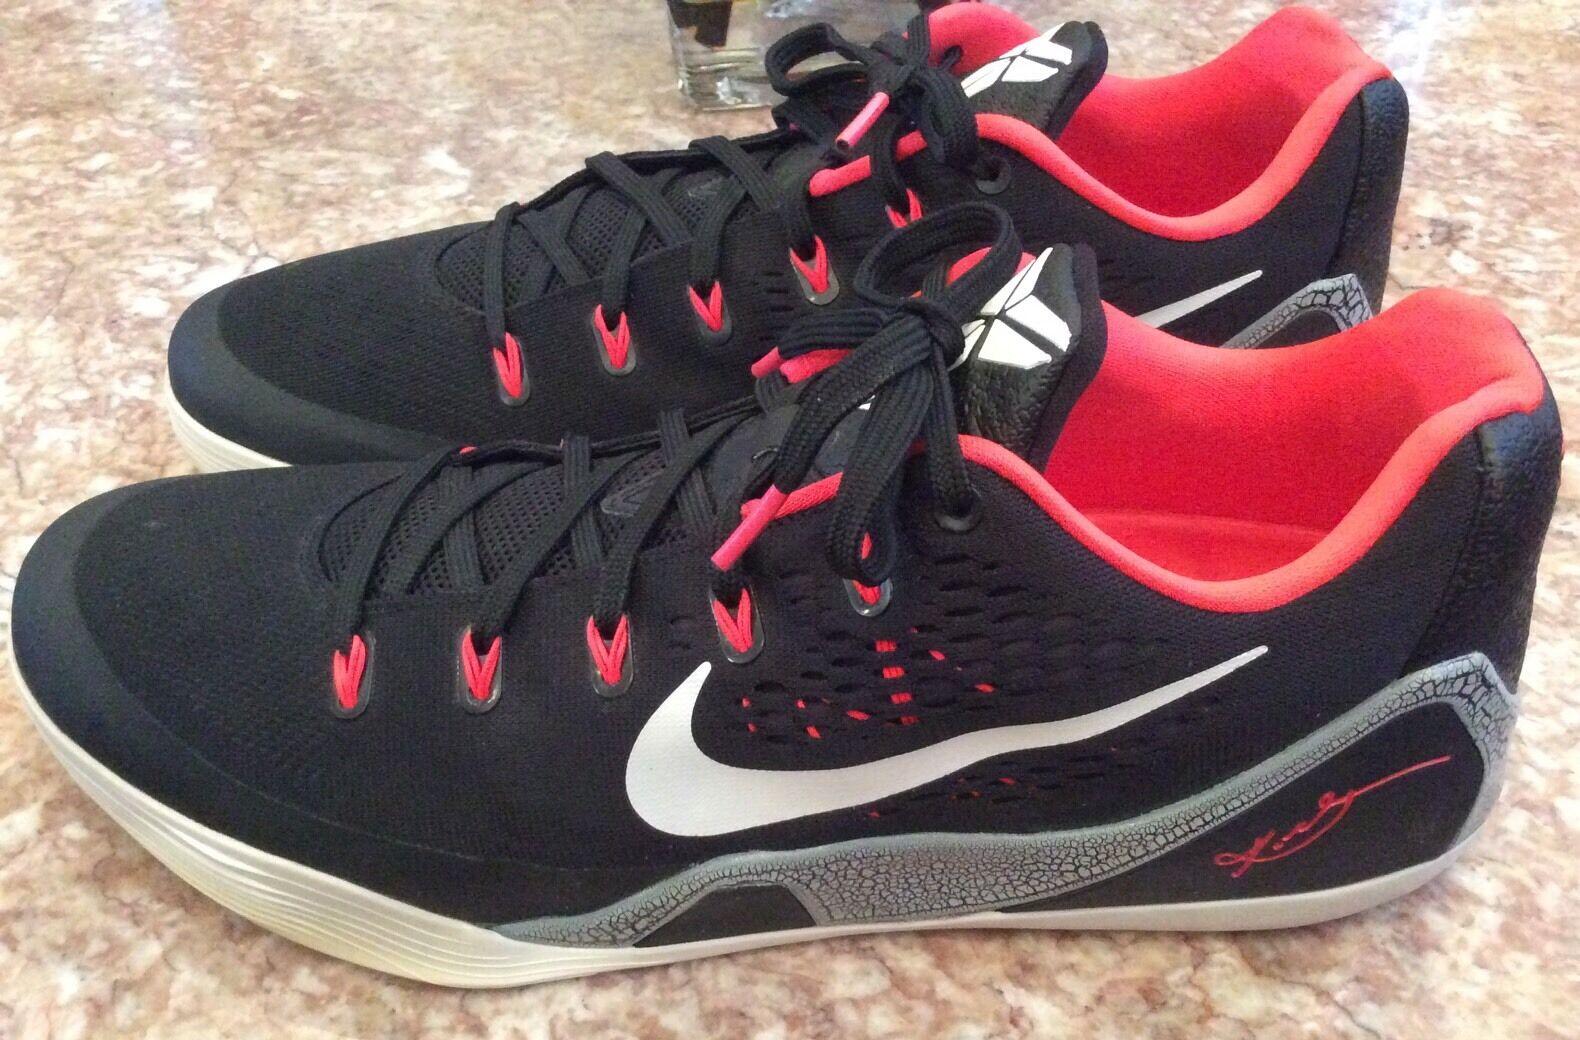 Nike Kobe 9 IX Low EM Nero White Laser Crimson Cement XI Size 14, 646701-001